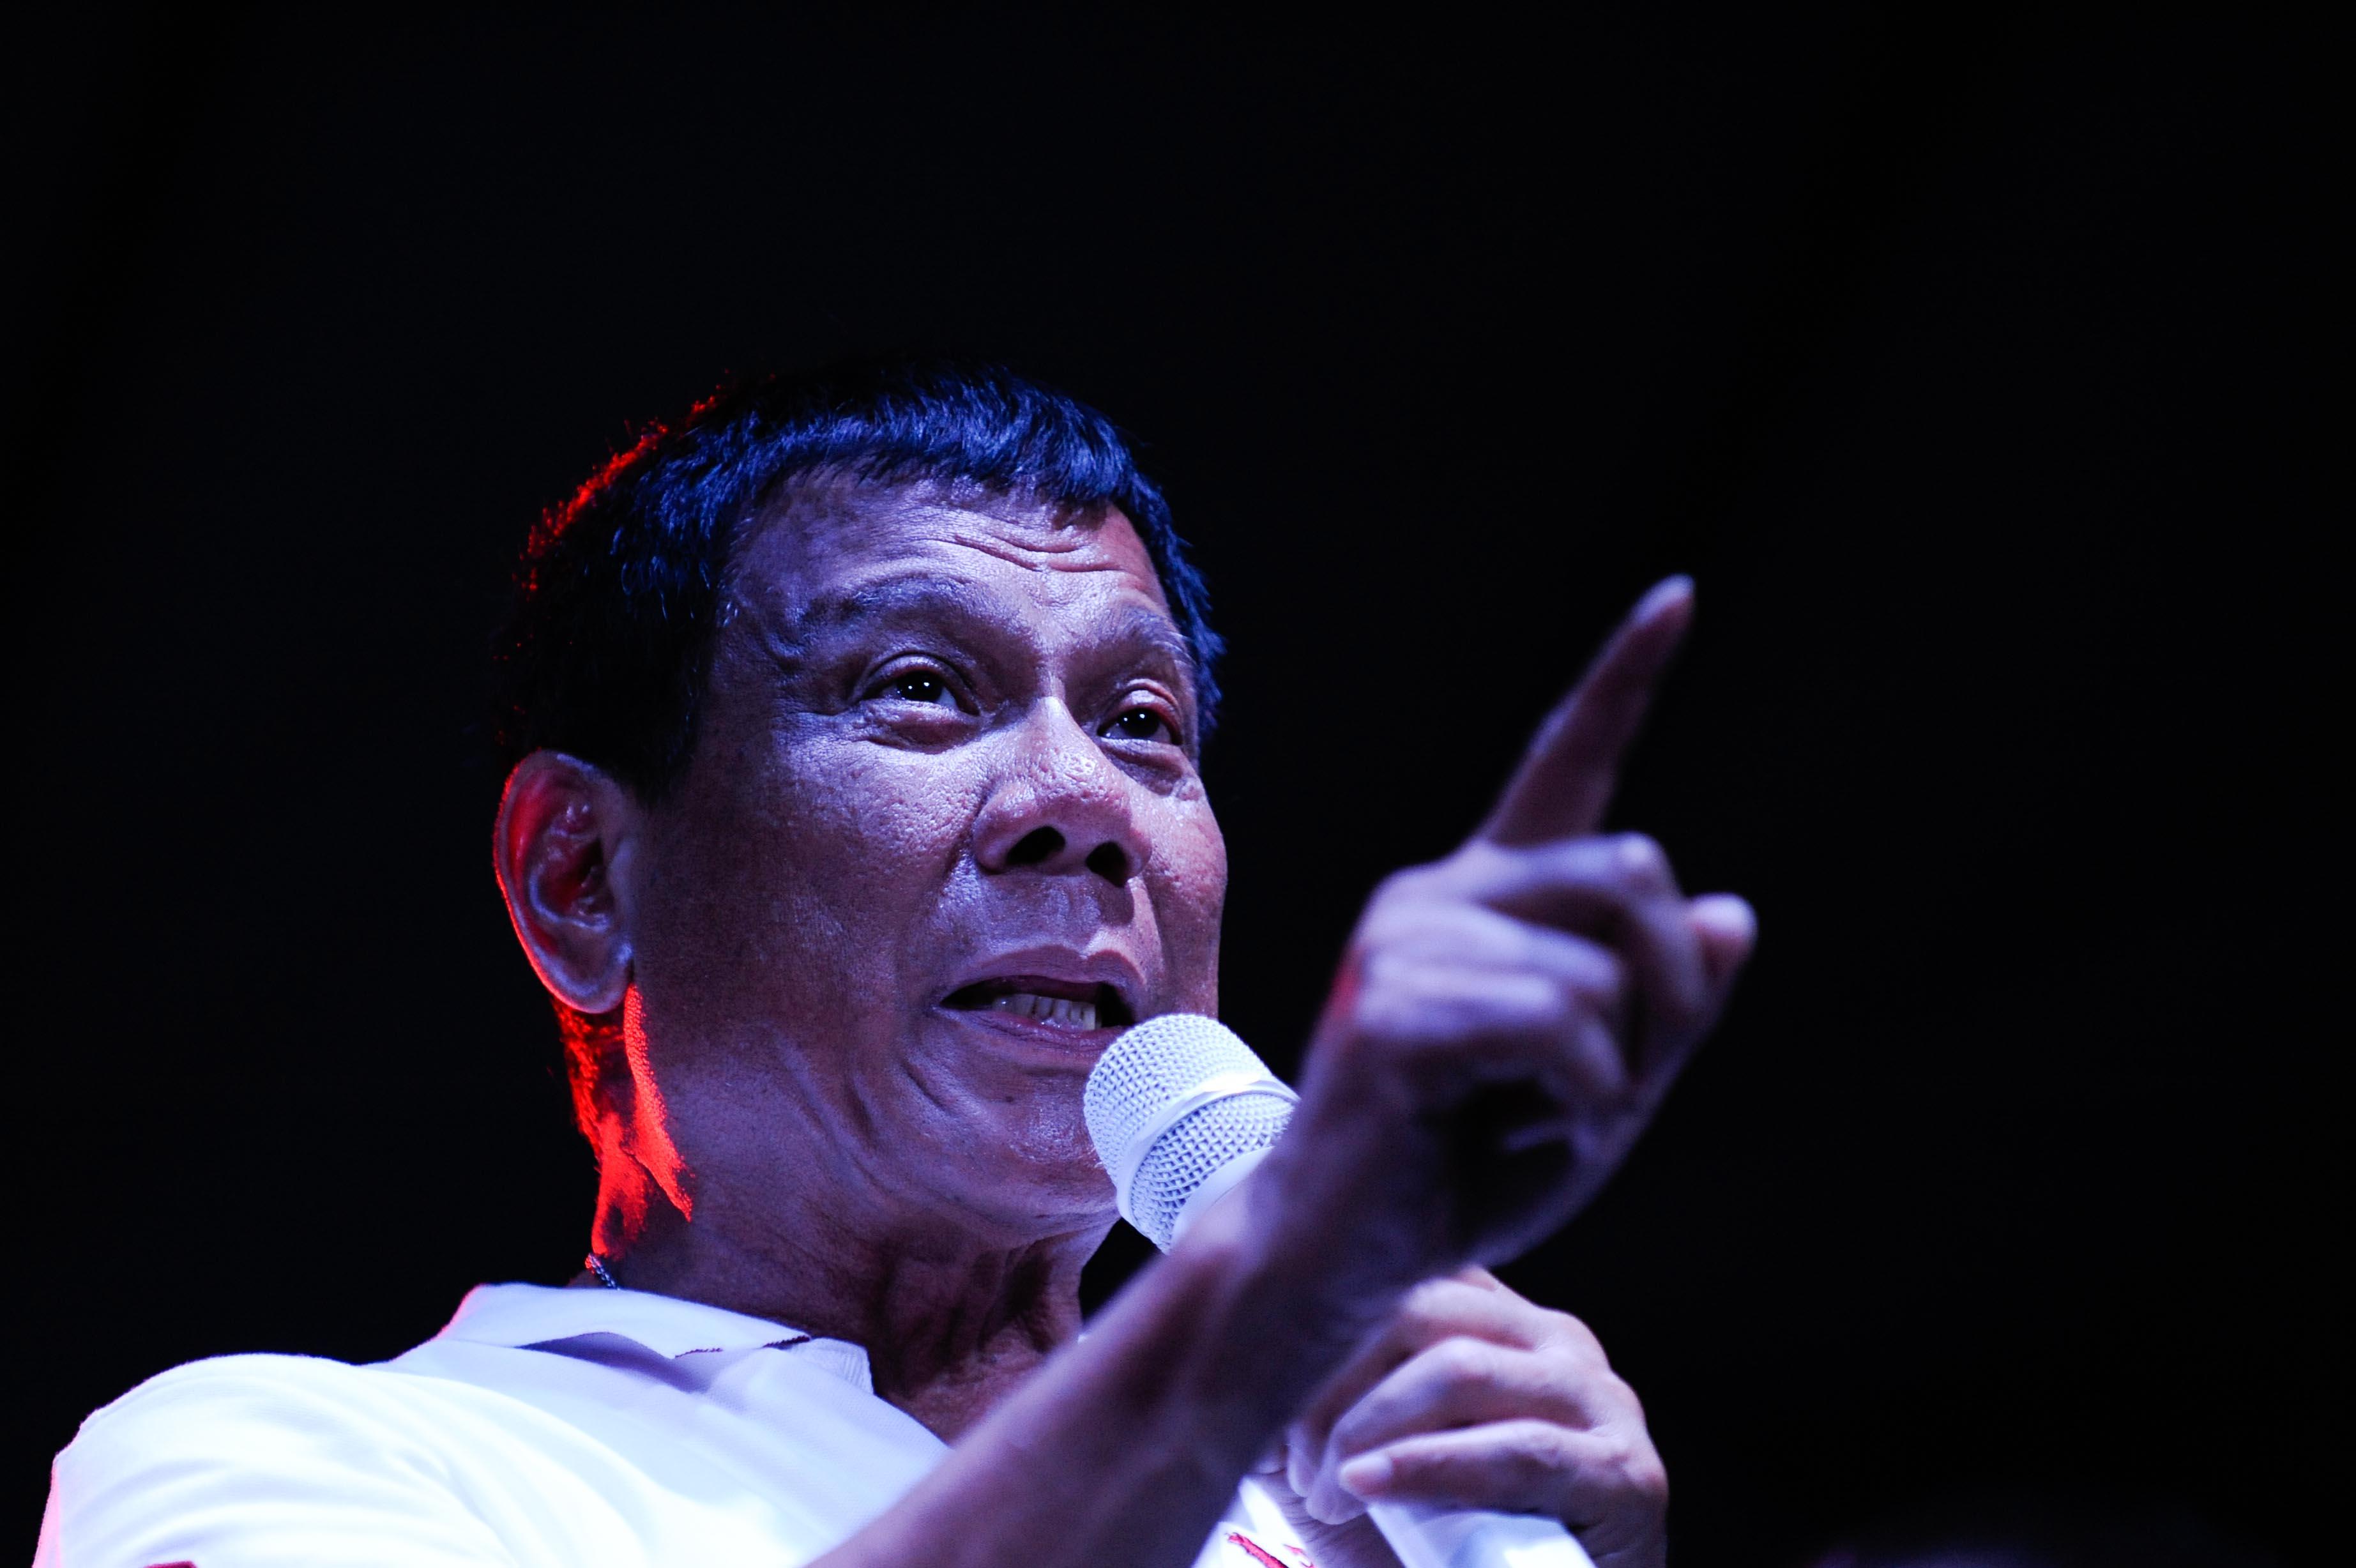 Rodrigo Duterte at a labor day campaign rally in Manila on May 1, 2016.